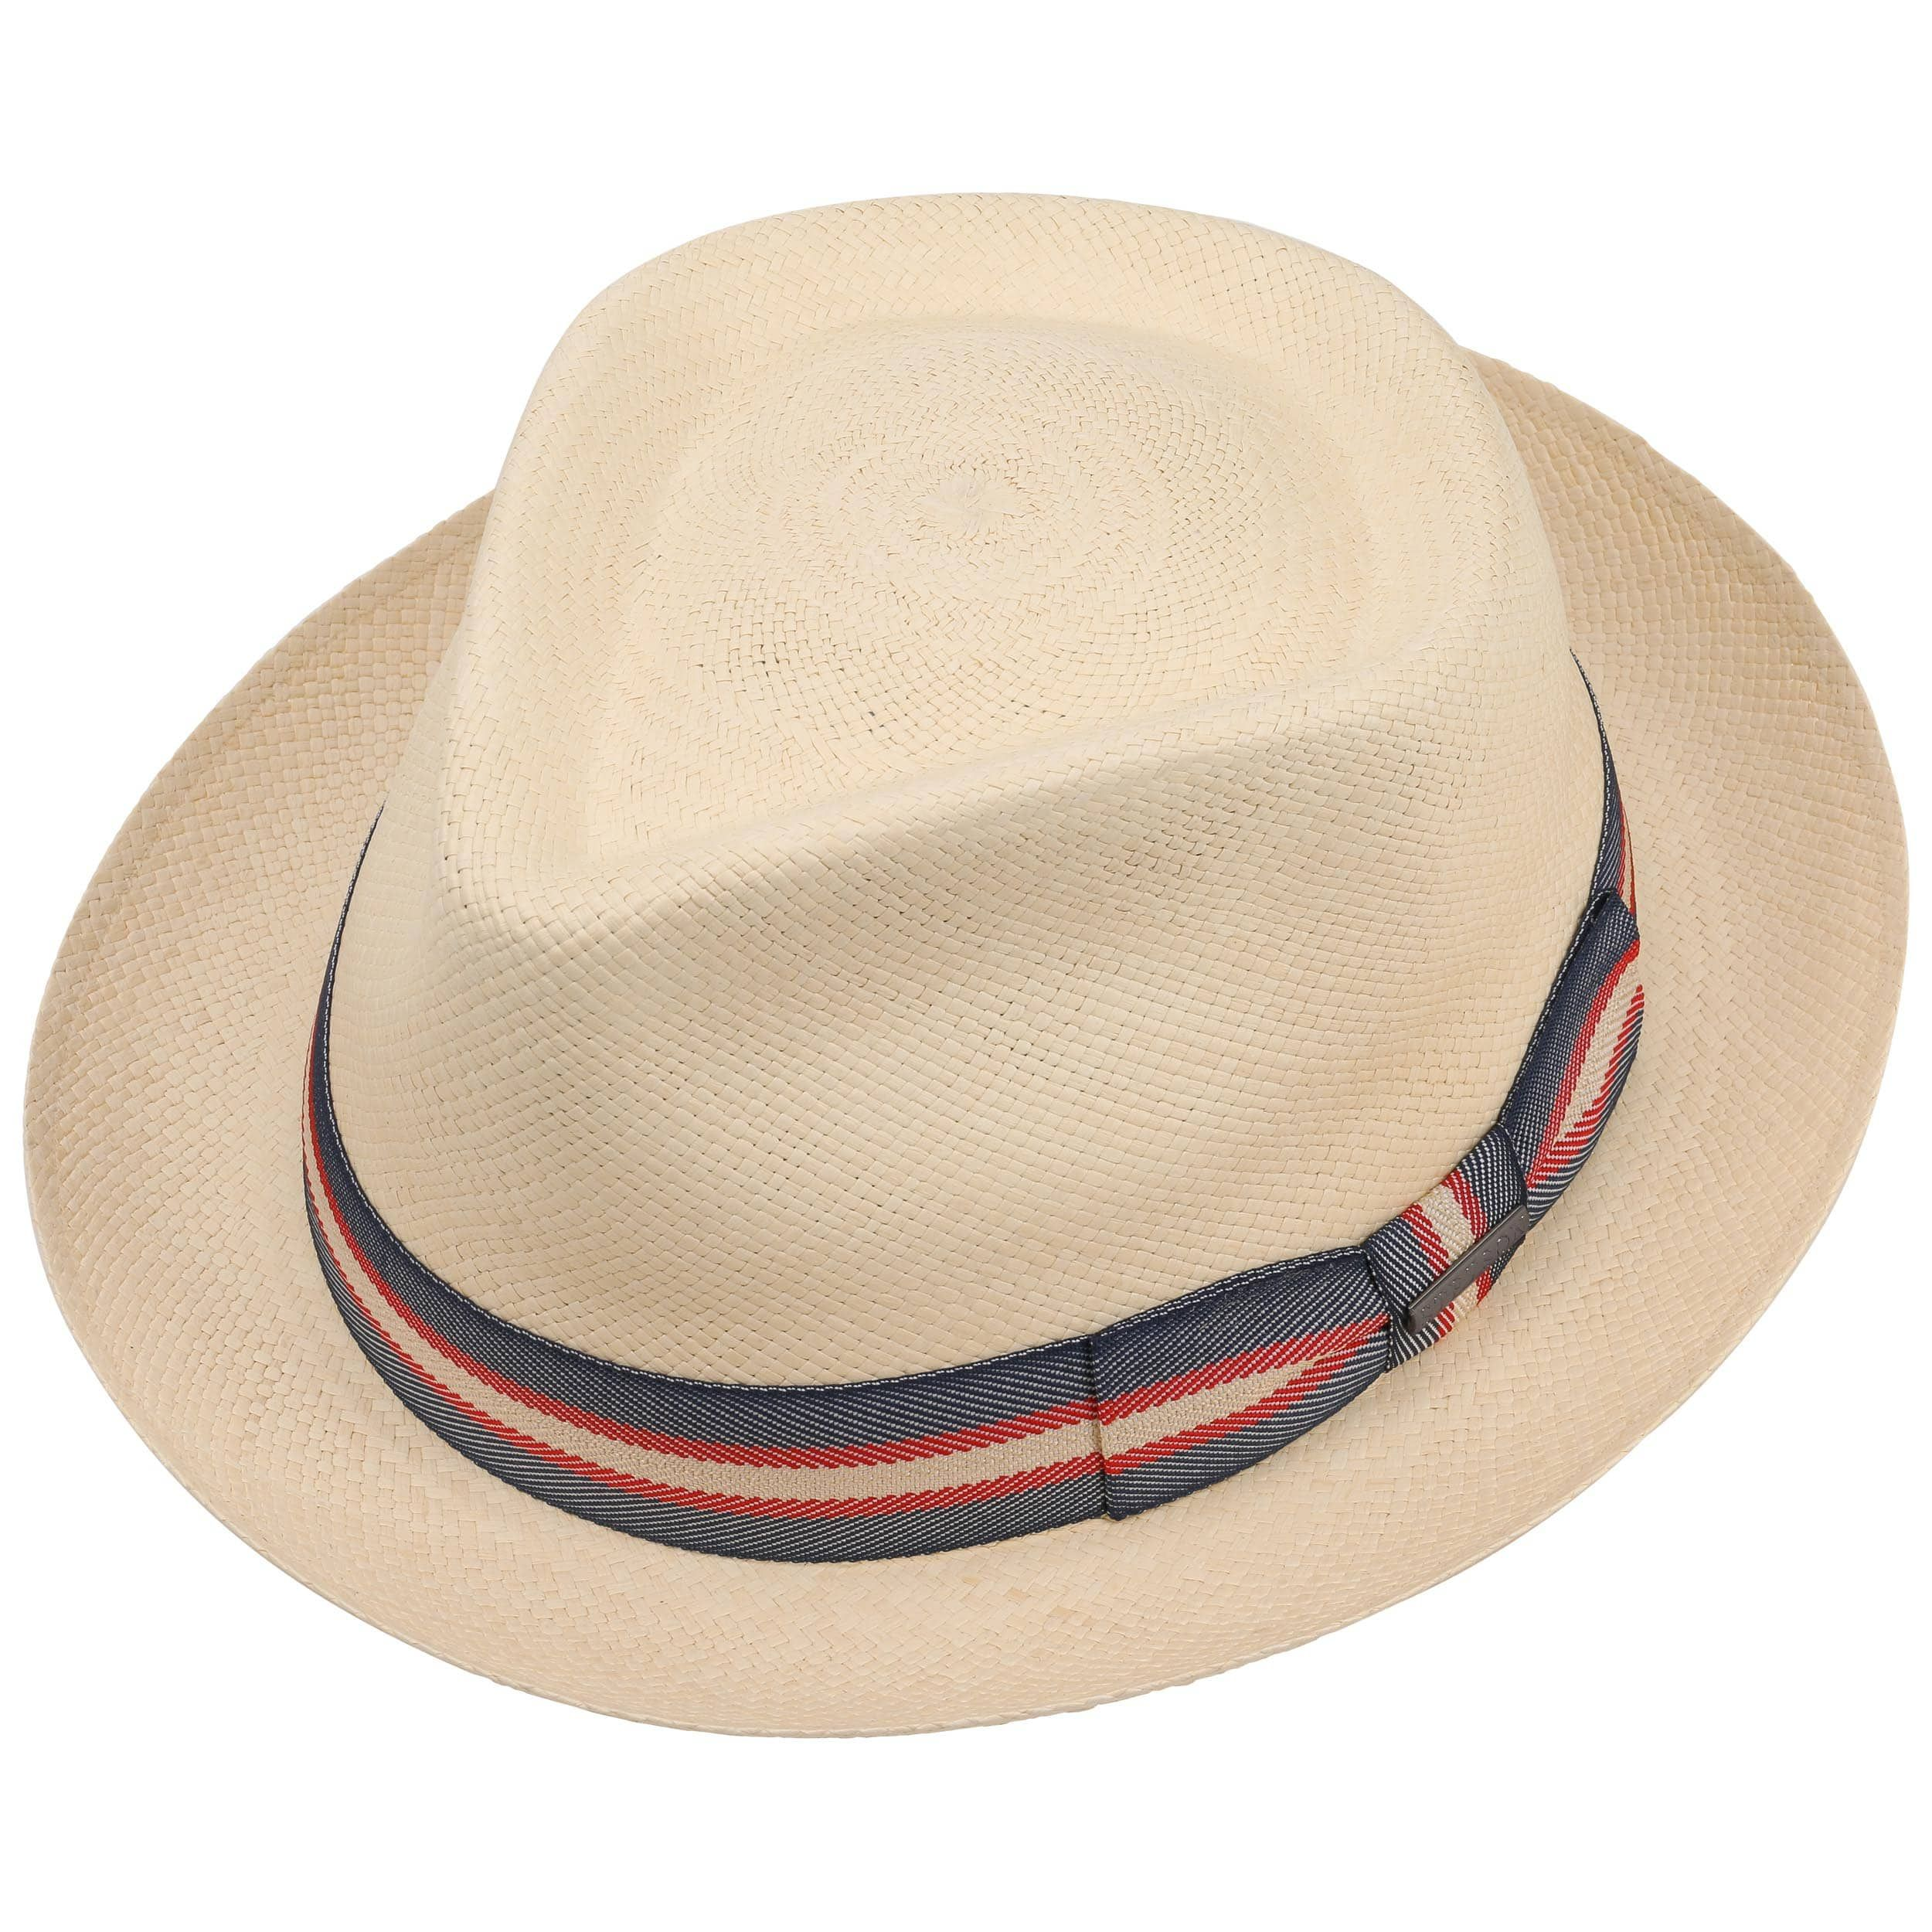 Ocate Panama Player Strohoed crèmewit